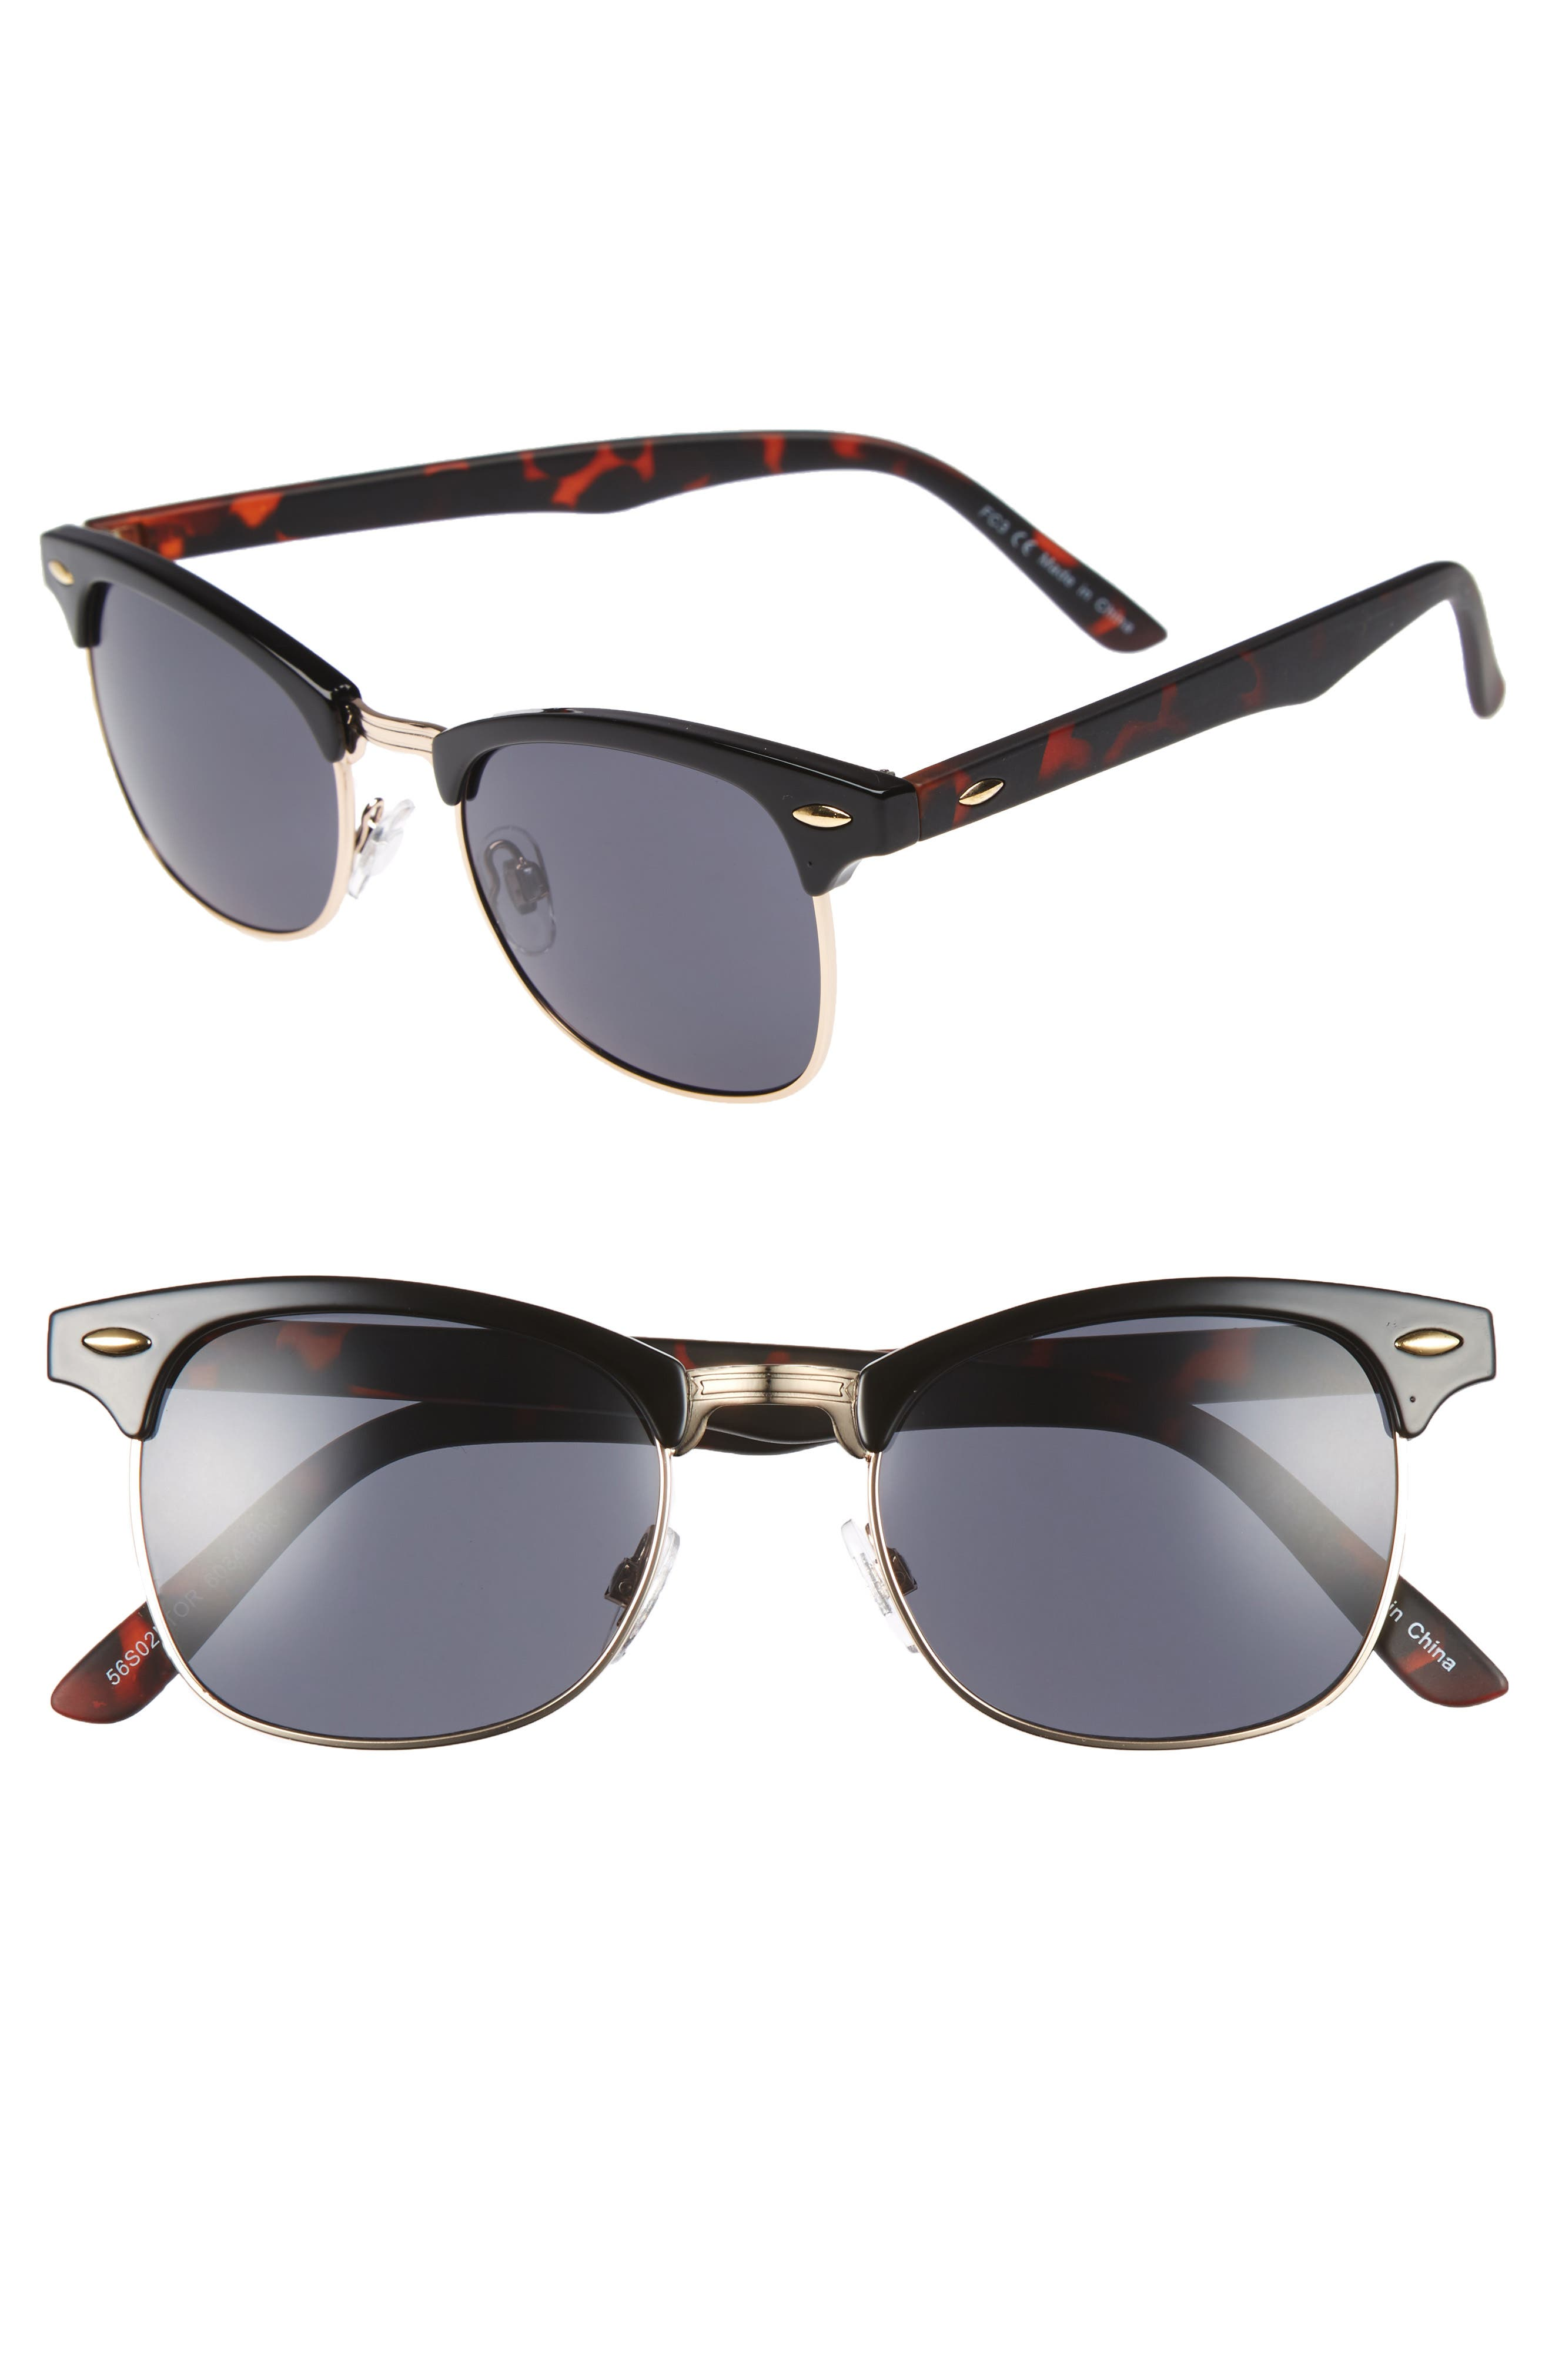 Topman Clubmaster 50mm Sunglasses